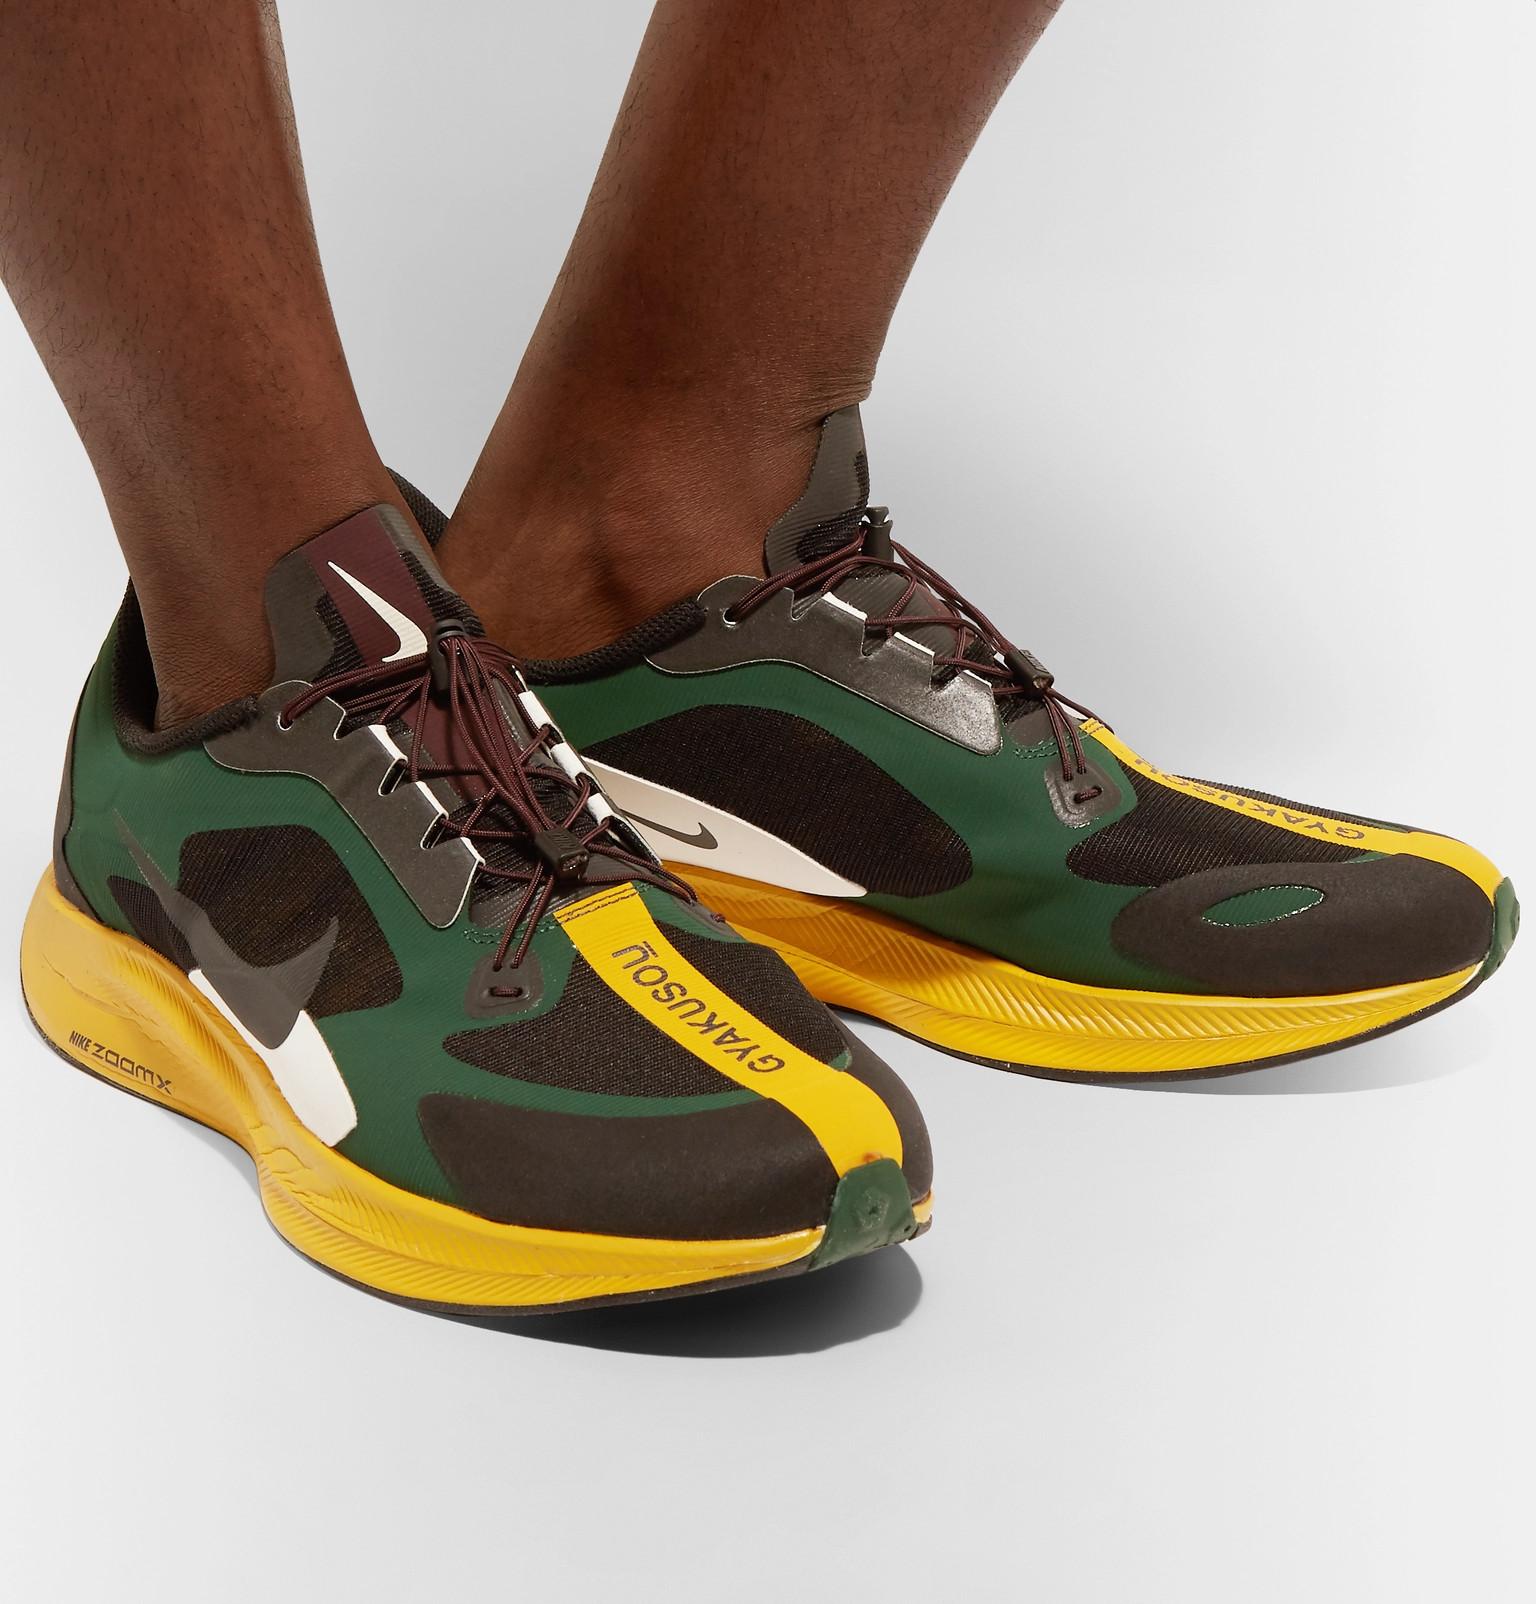 babe87e791a6 Nike x Undercover - + GYAKUSOU Zoom Pegasus Turbo Mesh Sneakers